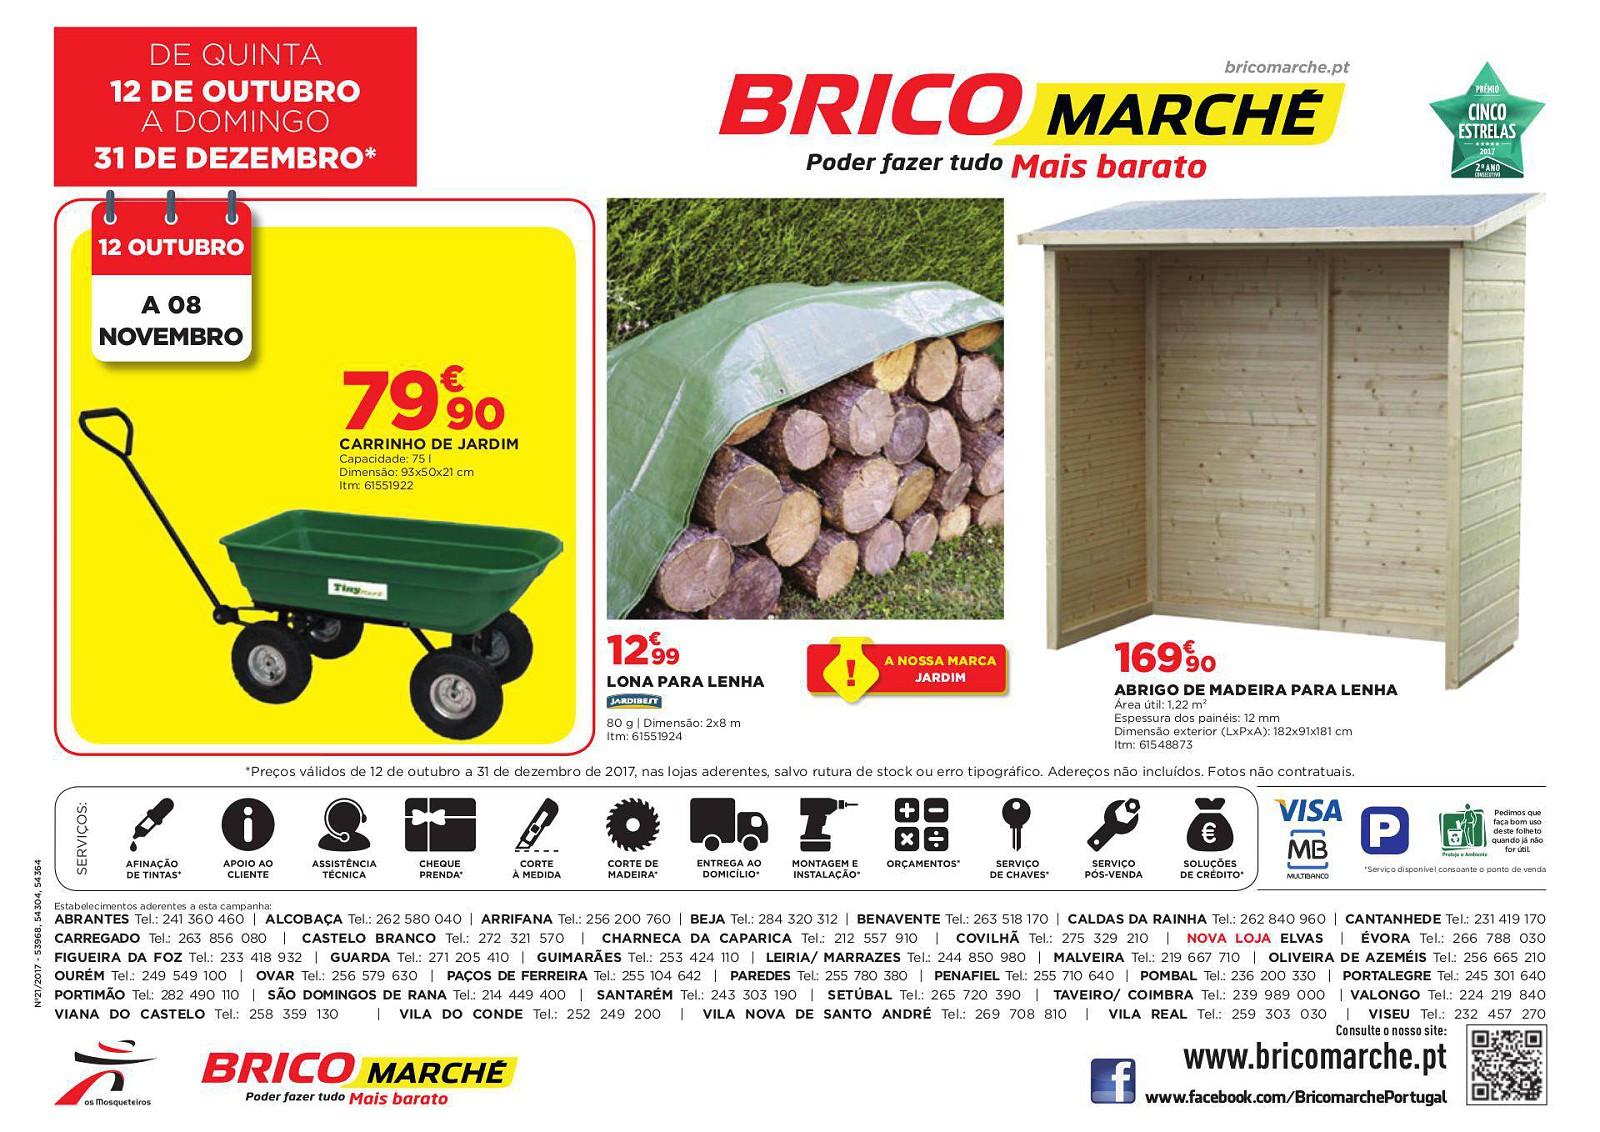 antevisao-promocoes-folheto-bricomarche-12-outubro-a-31-dezembro-24.jpg